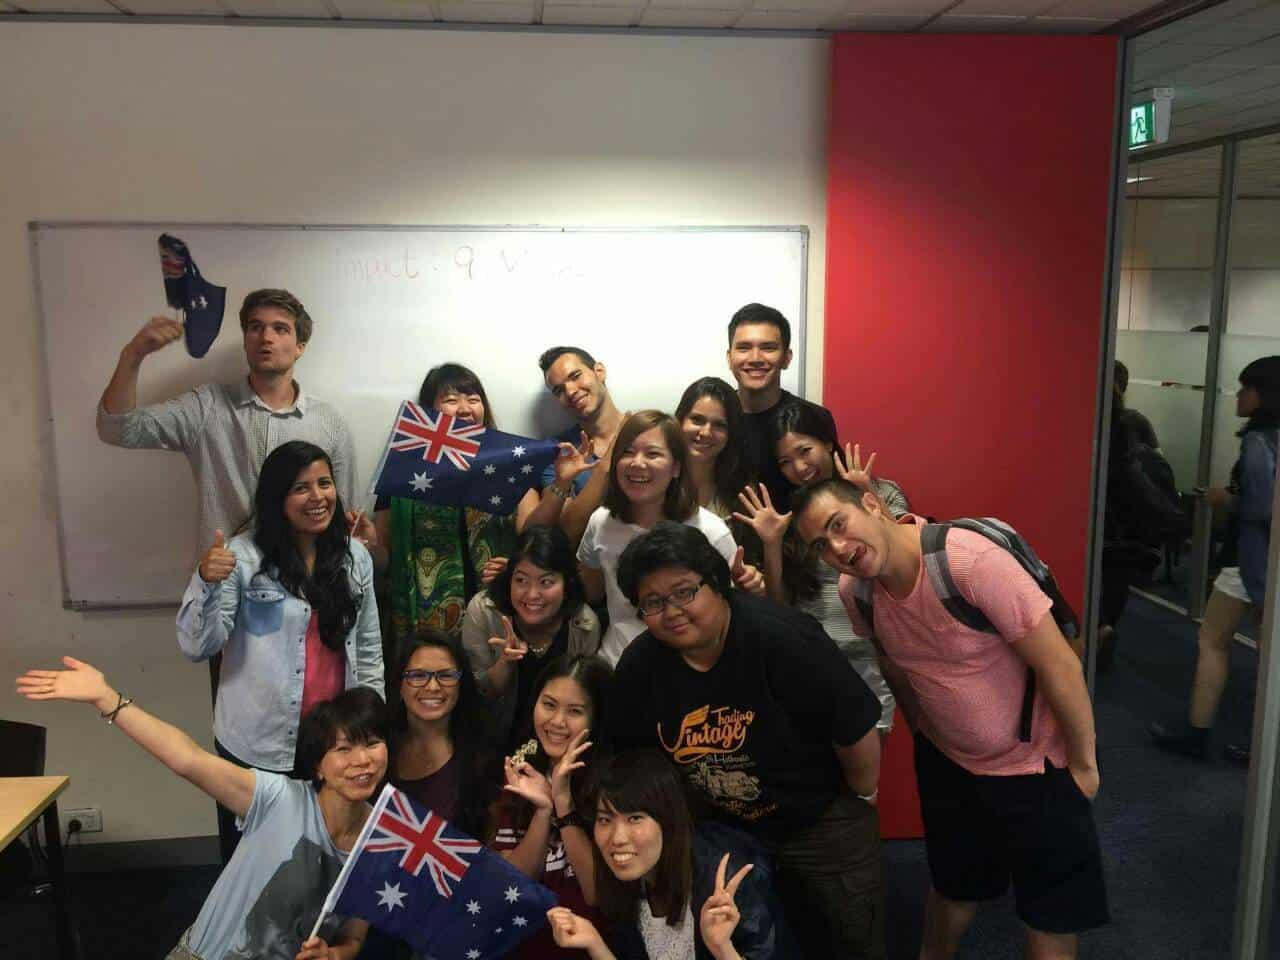 Student Stories จากน้องโอ๊ต เรียนภาษาอังกฤษที่สถาบันสอนภาษา Impact English College